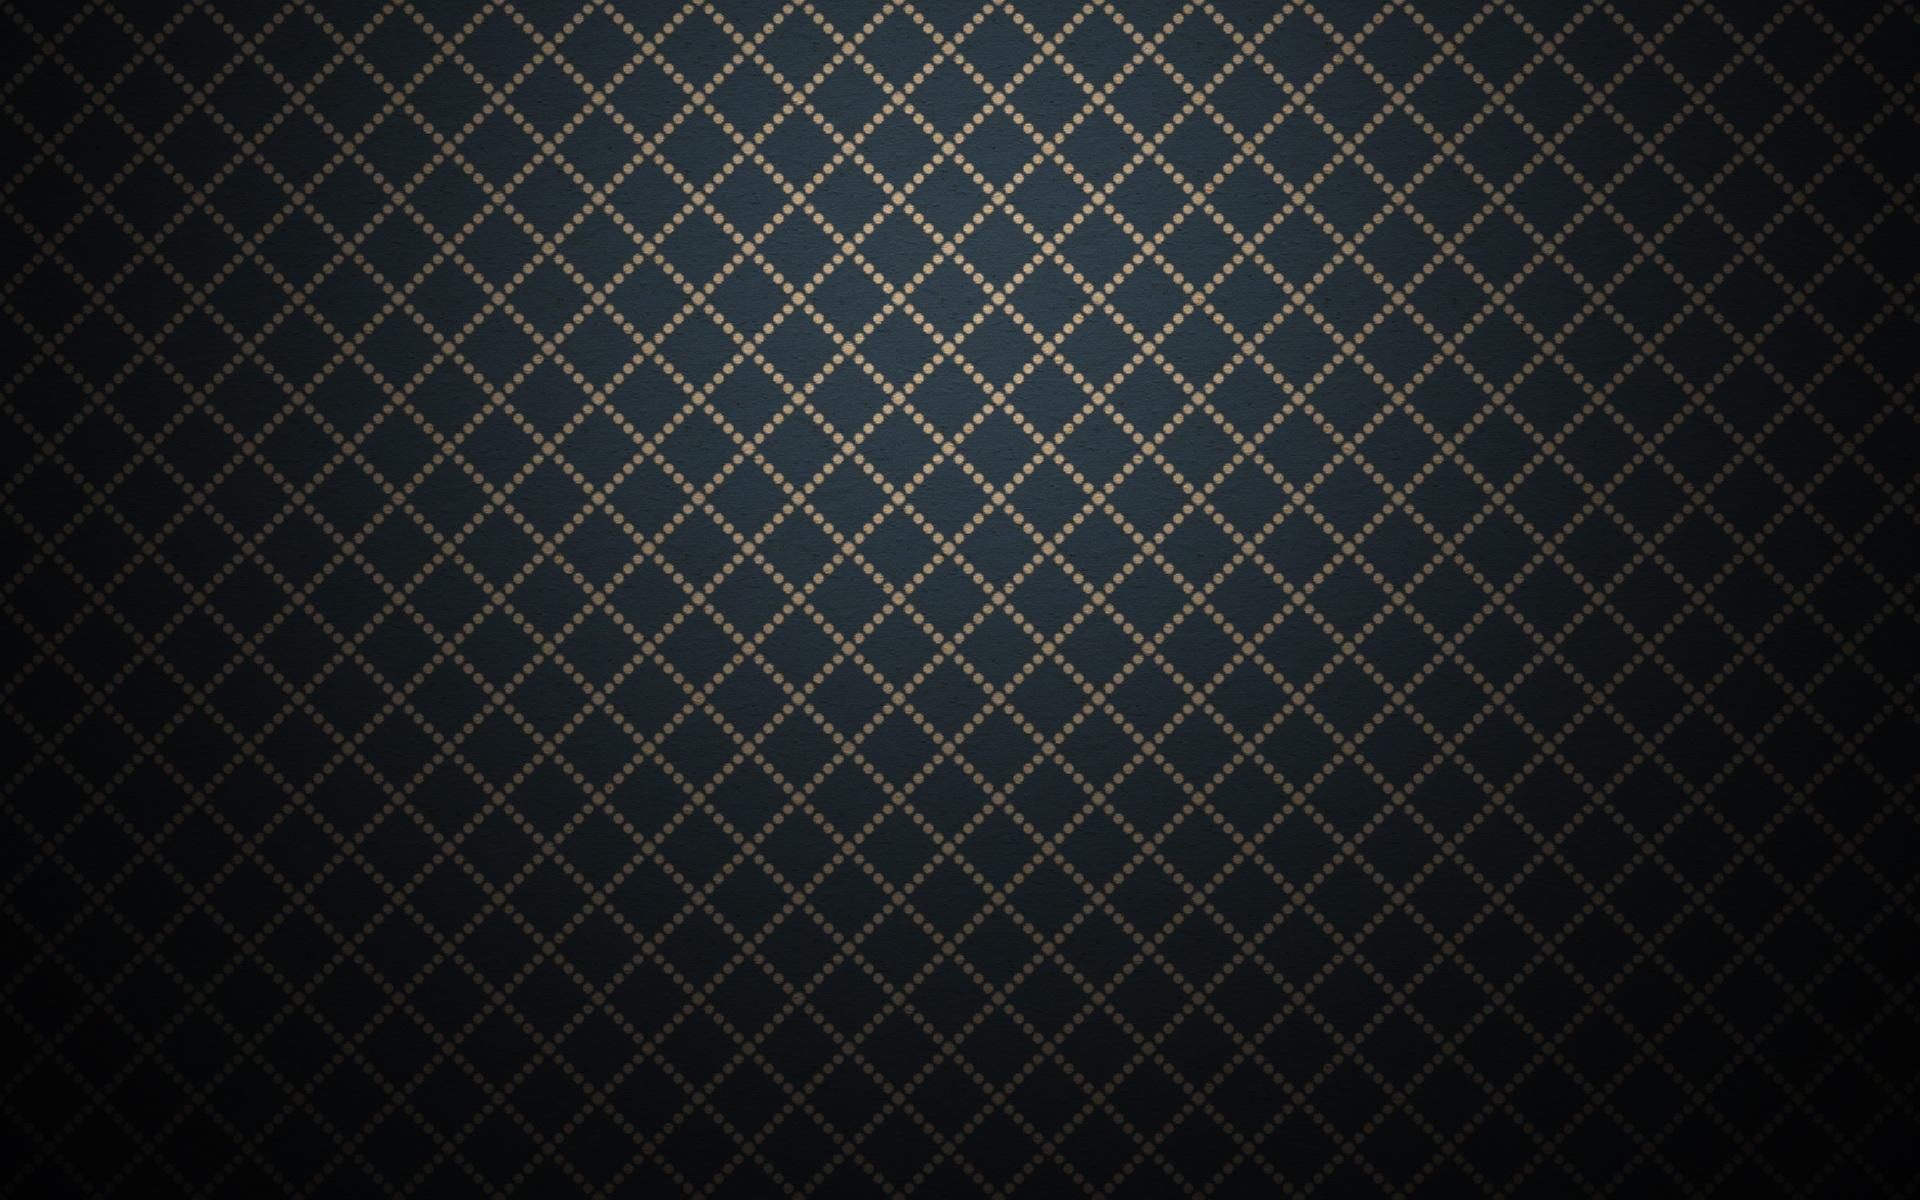 Black Pattern Wallpaper HD Wallpaper 1920x1200